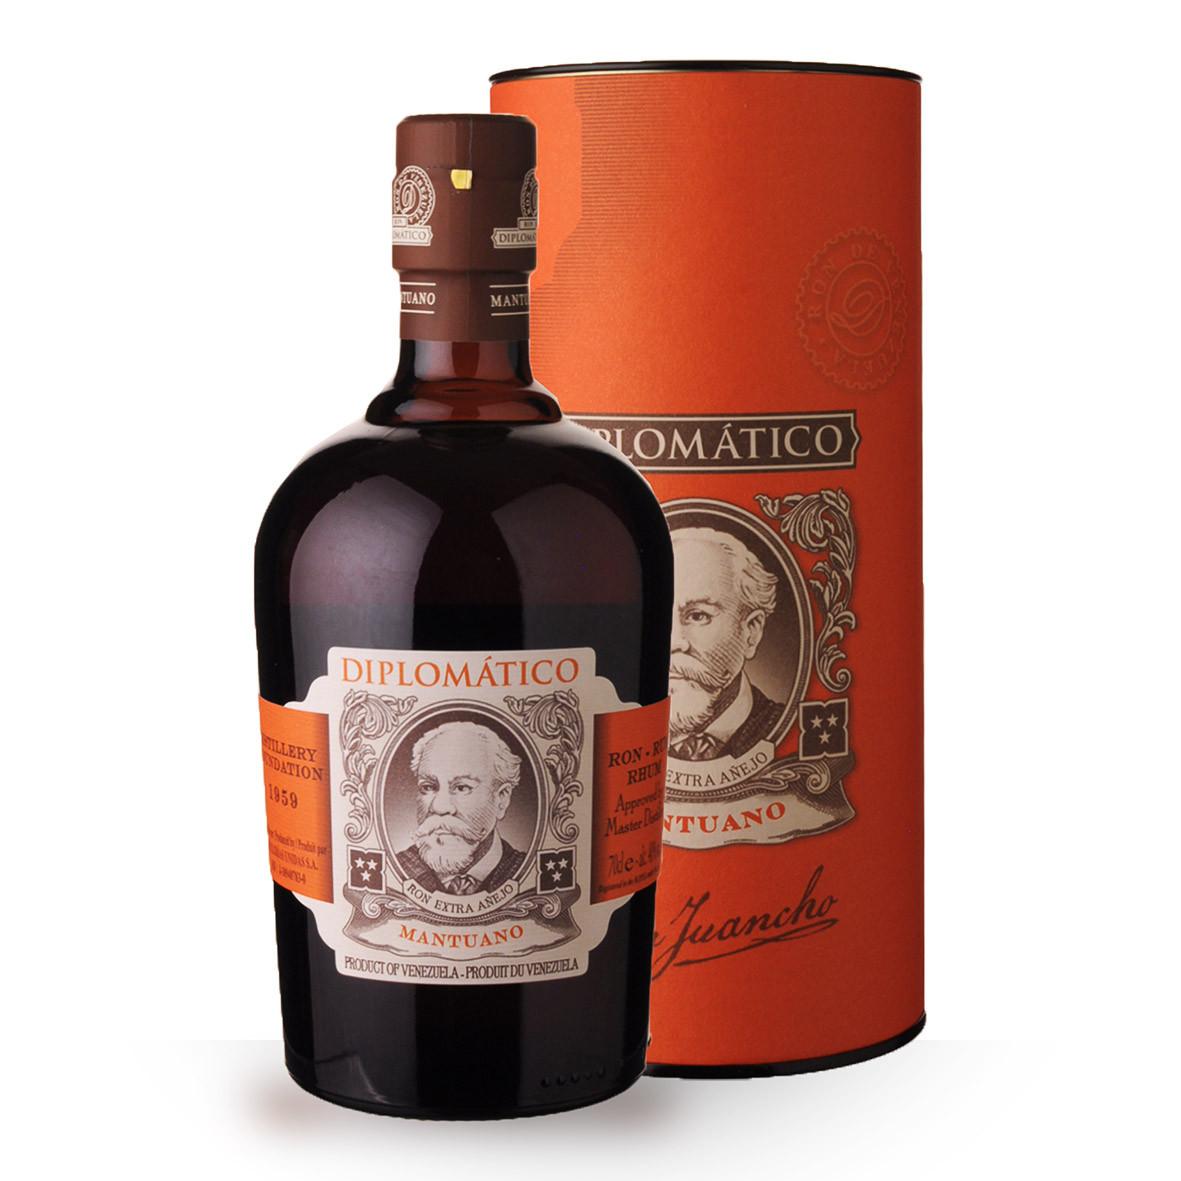 Rhum Diplomatico Mantuano 8 ans 70cl Coffret www.odyssee-vins.com